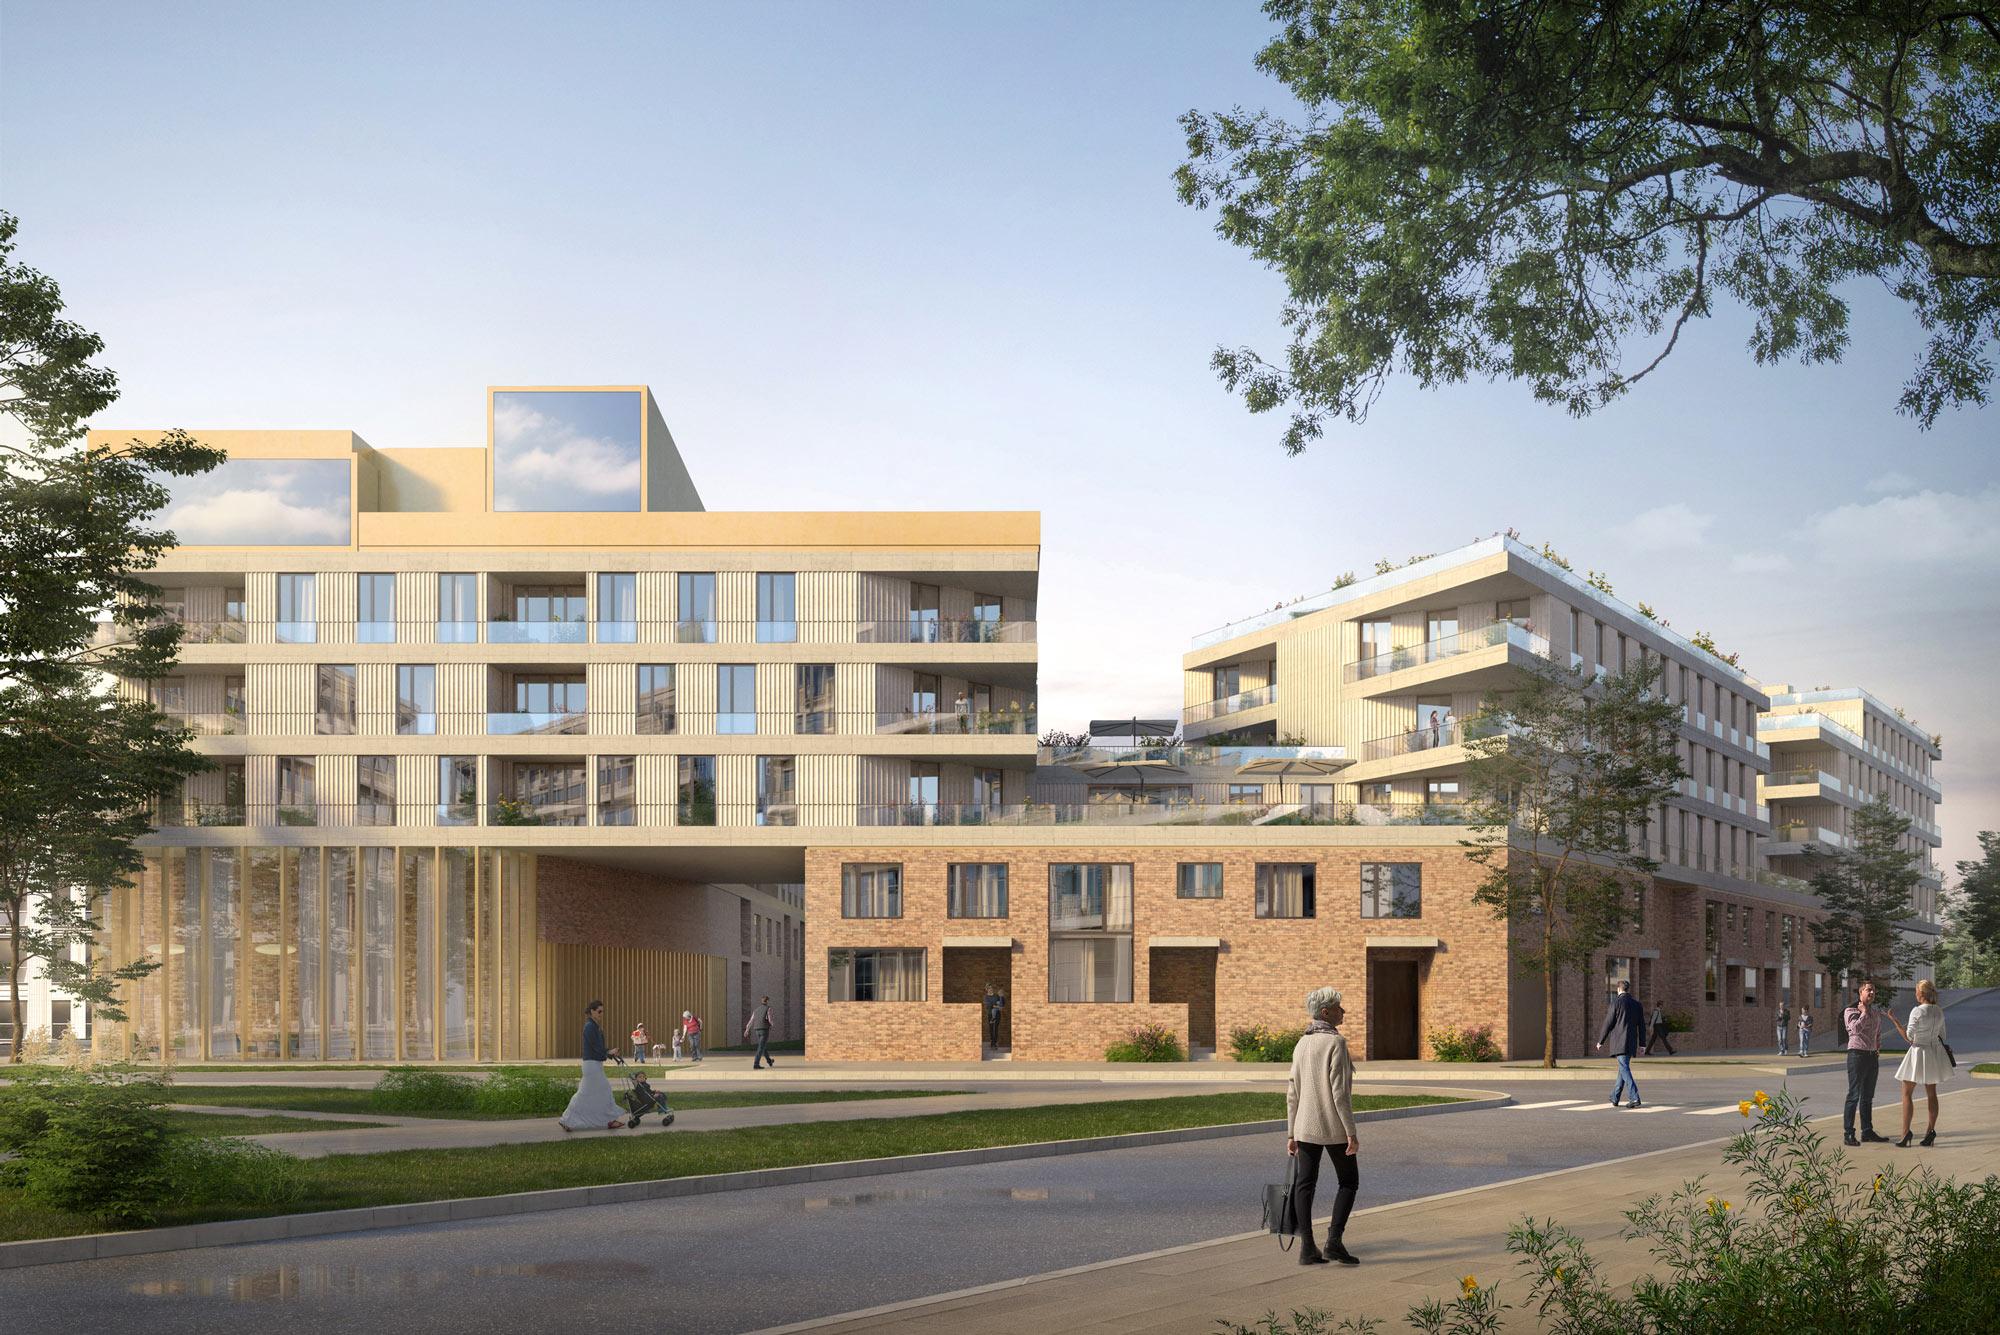 Martin Duplantier Architectes | Social housing in France